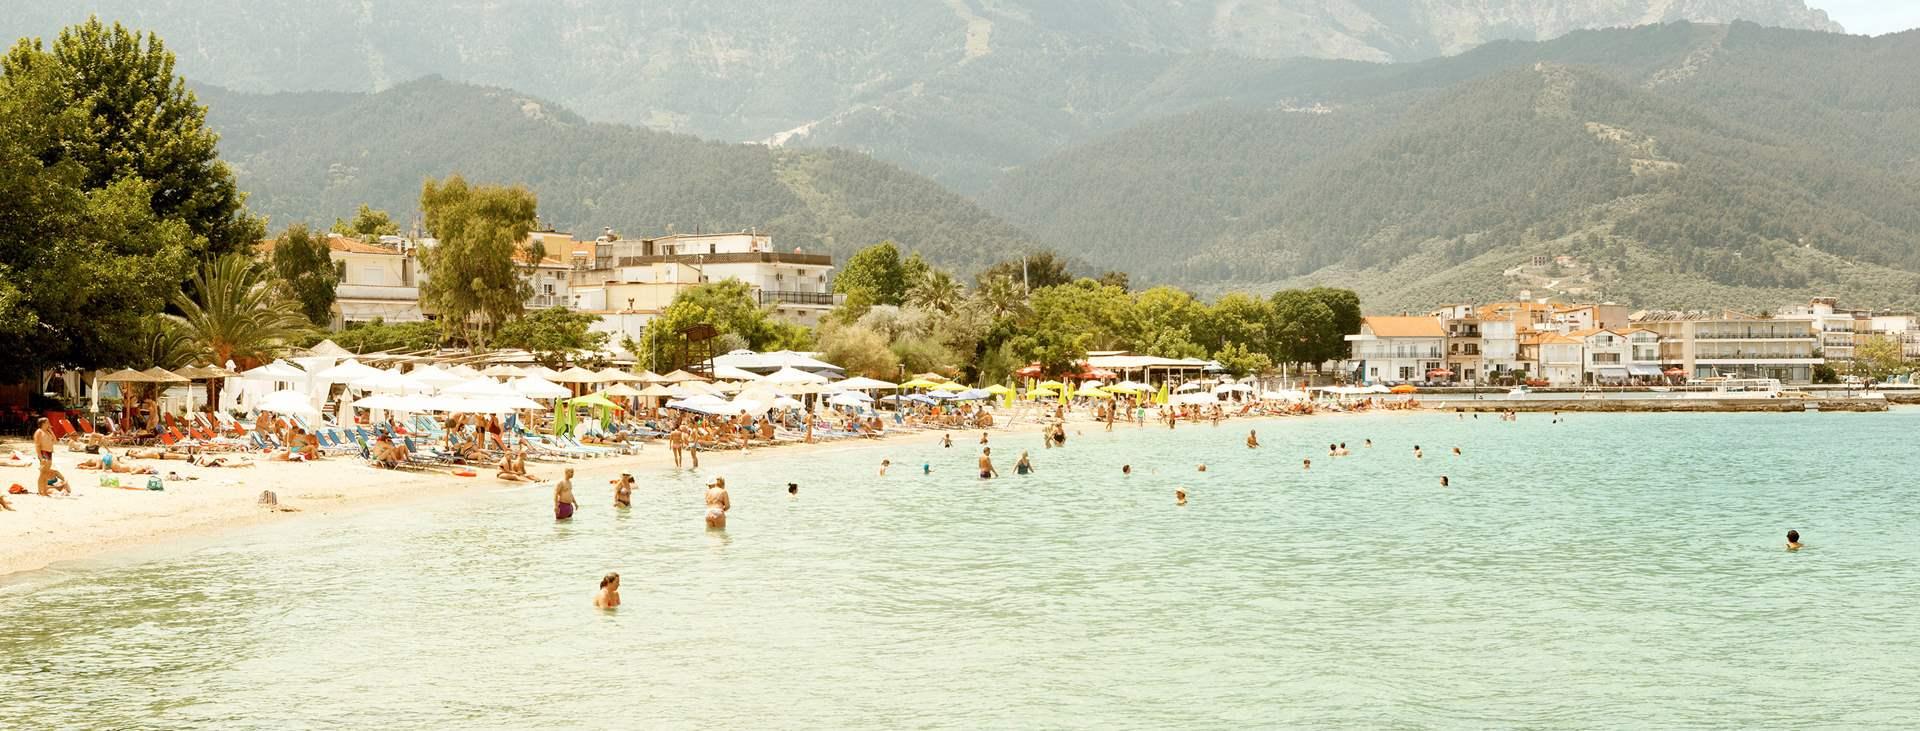 Bestill en reise til Thassos by i Hellas med Ving